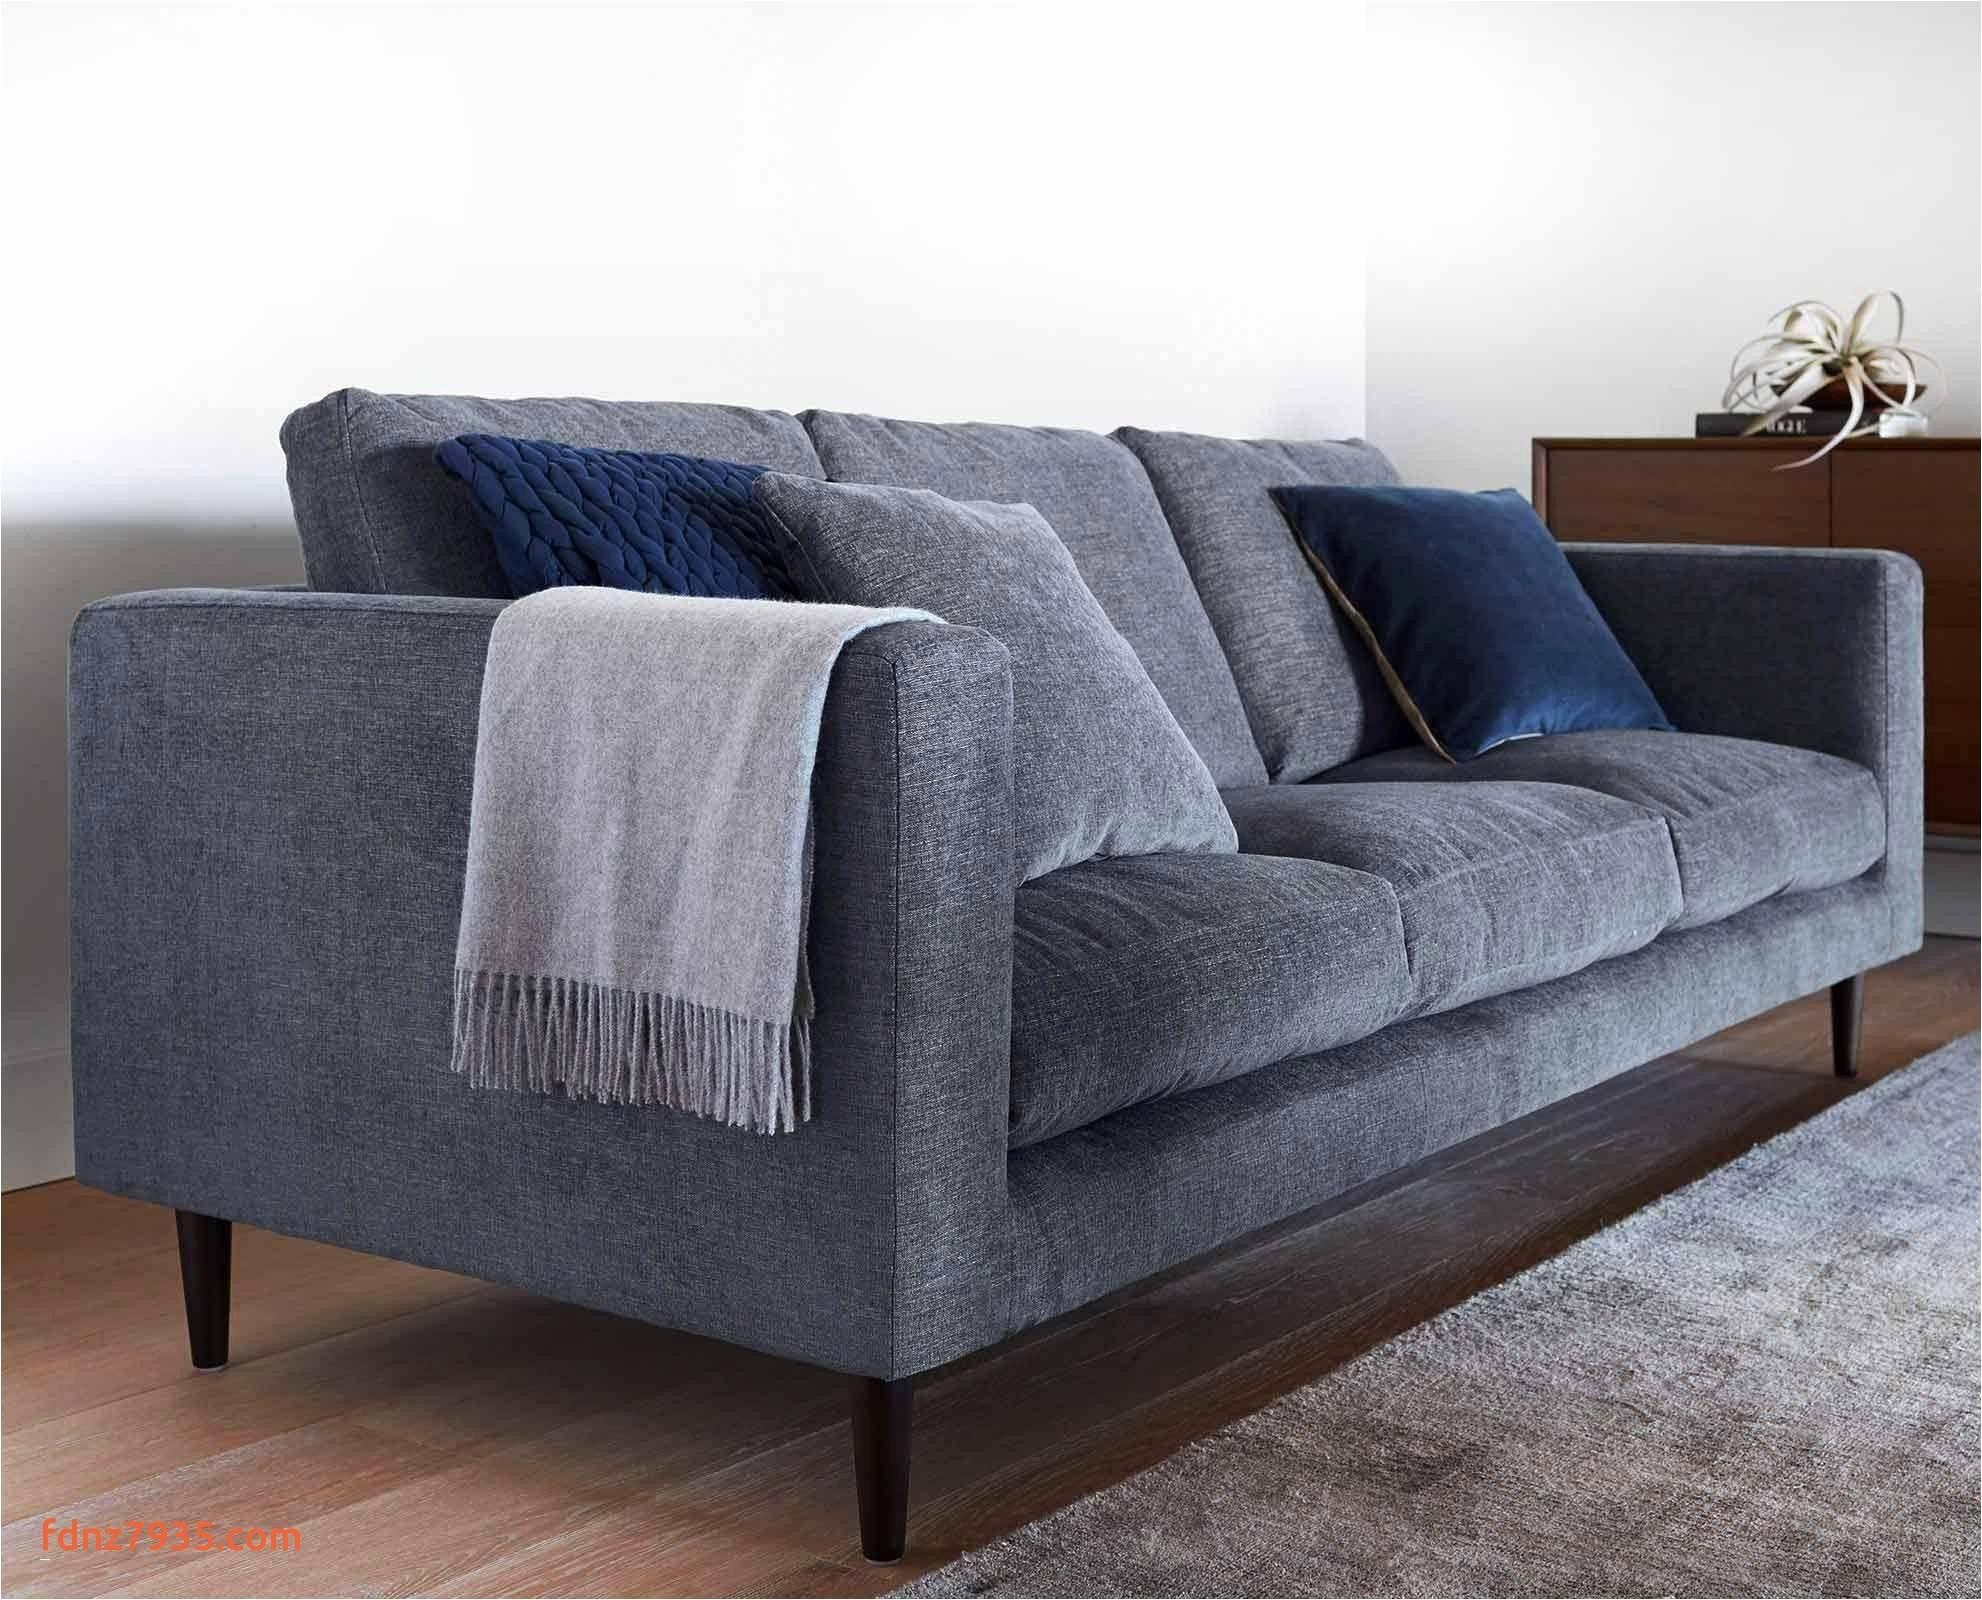 l shaped sleeper sofa elegant l shaped sleeper sofa designsolutions usa of l shaped sleeper sofa 1